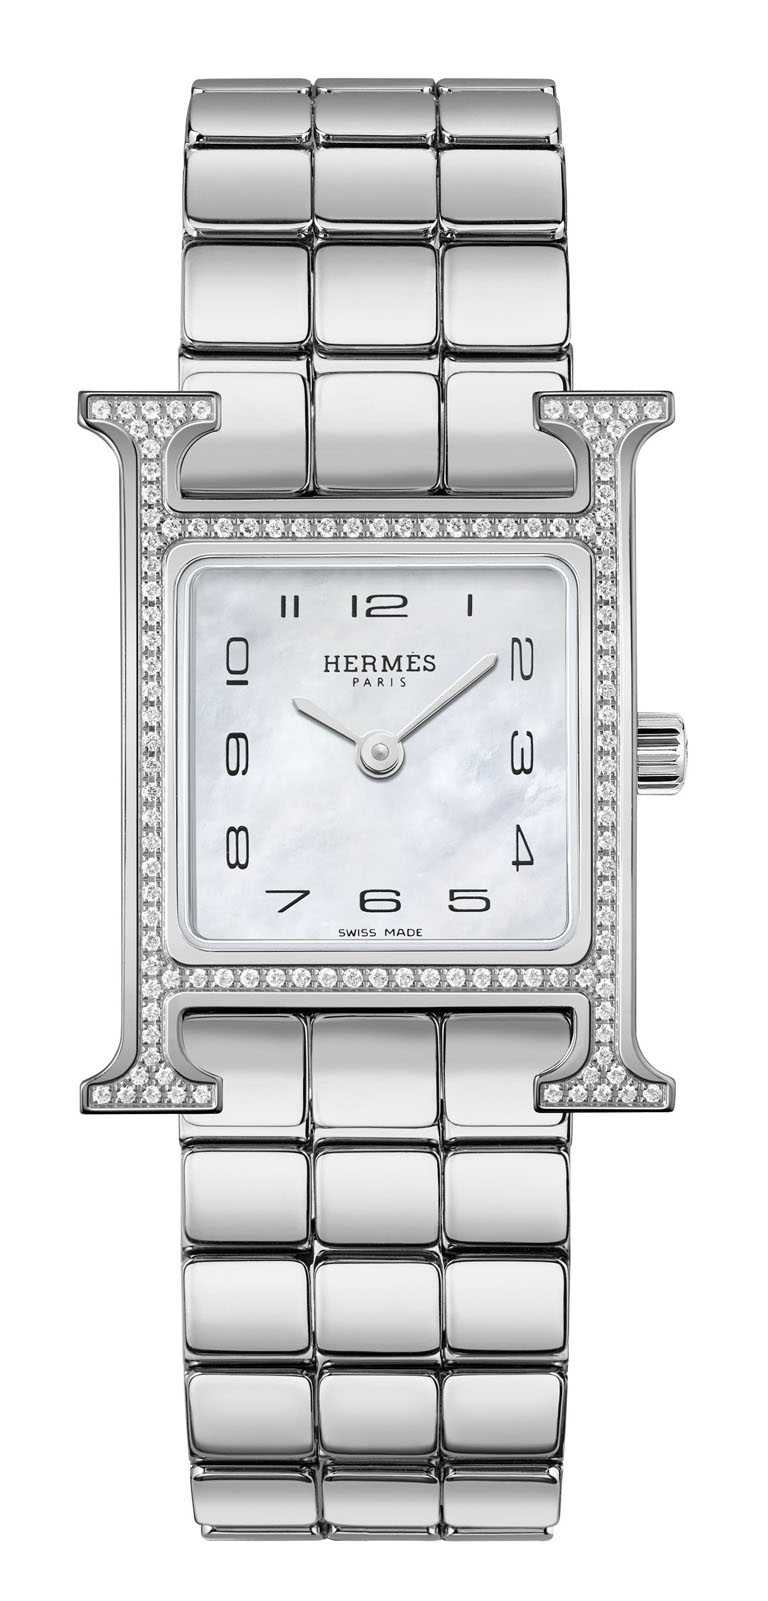 HERMÈS「HEURE H」精鋼鍊帶腕錶,316L精鋼錶殼,21mm,鑽石114顆╱182,500元。(圖╱HERMÈS提供)